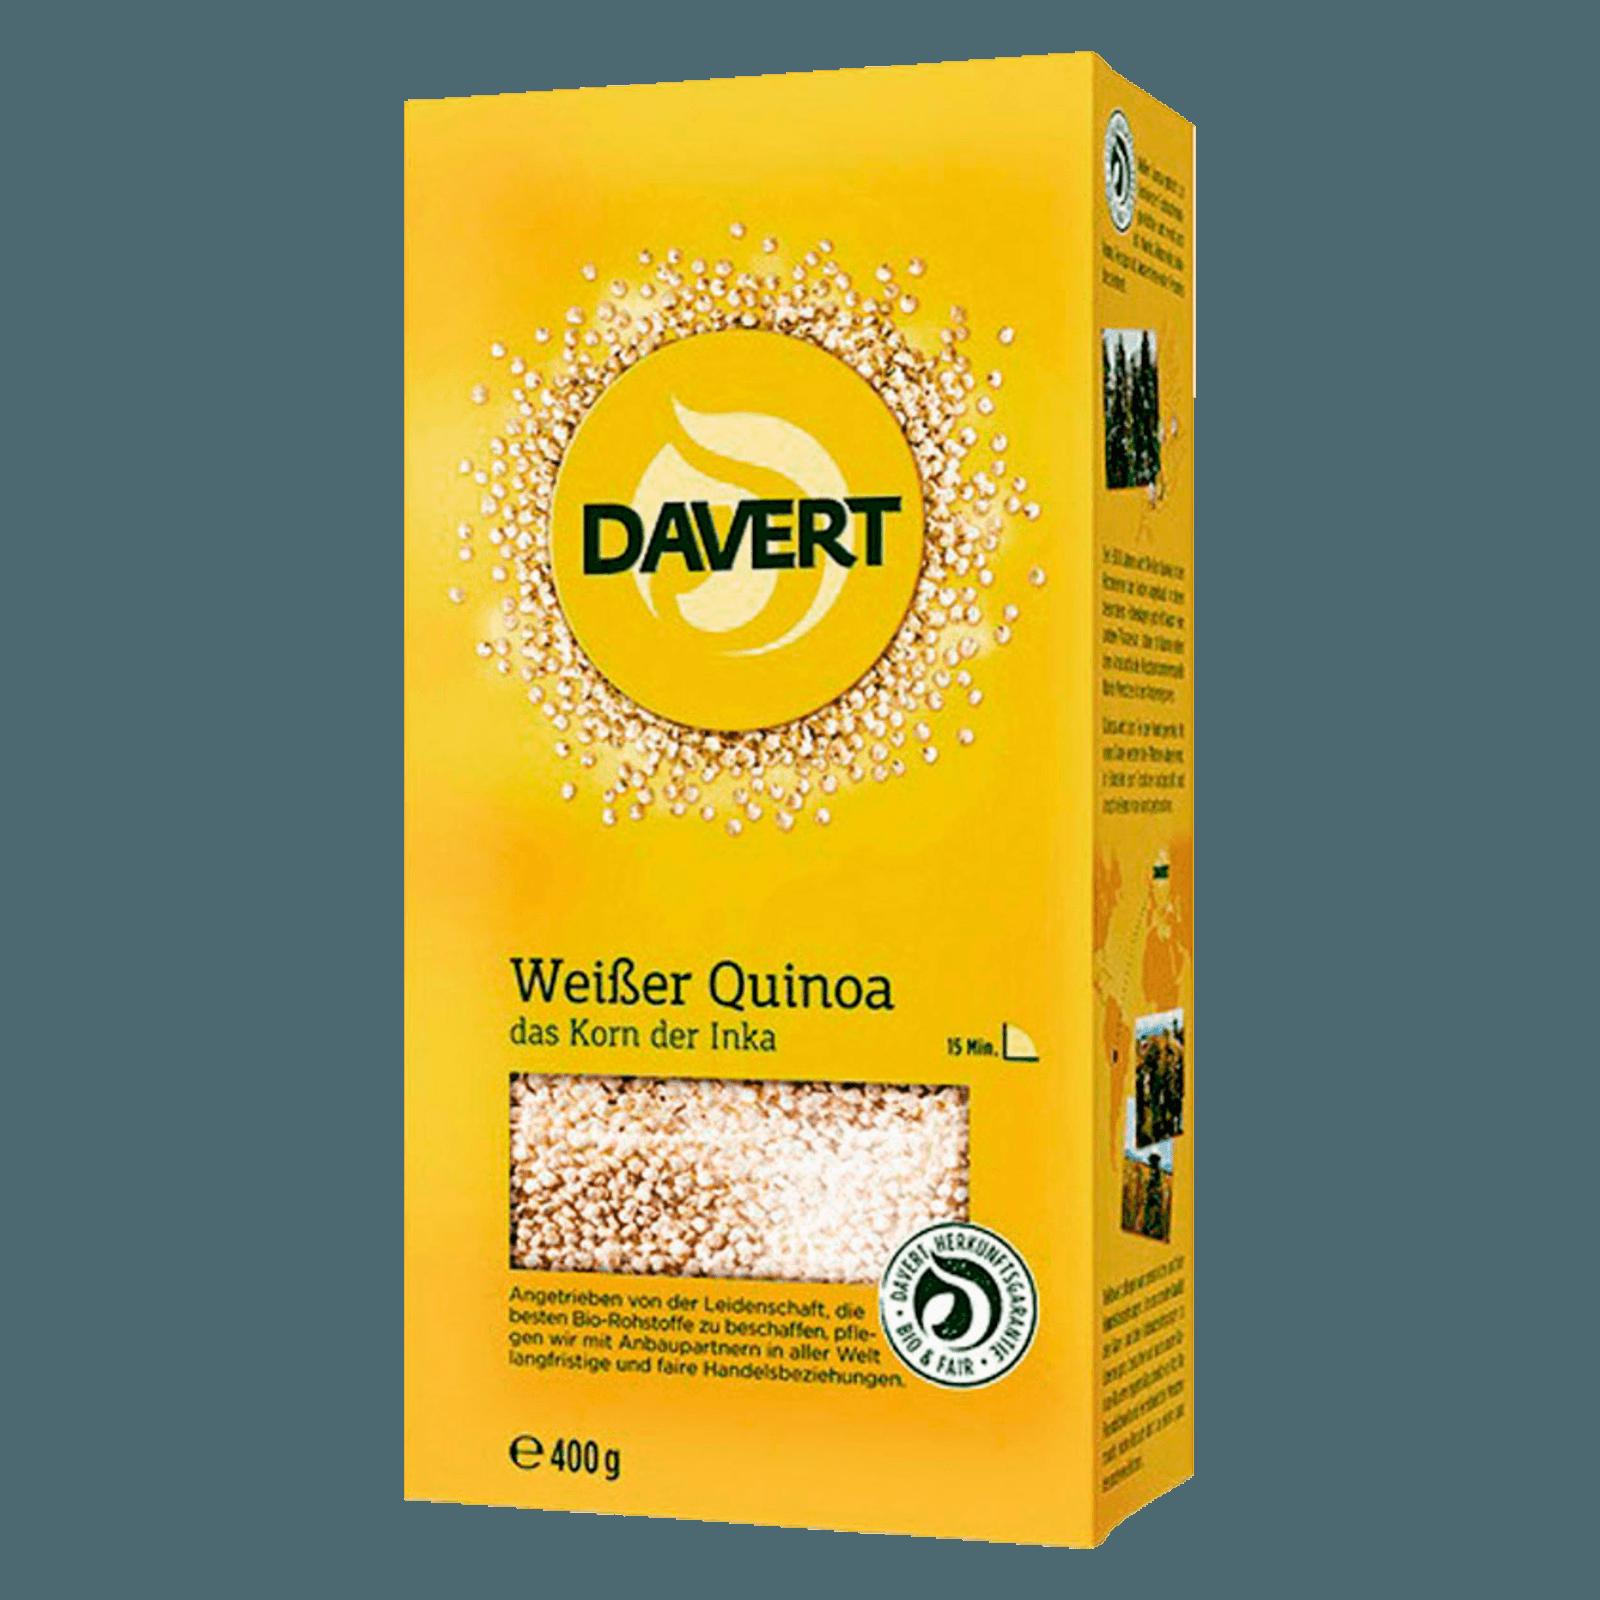 Davert Weißer Quinoa 400g